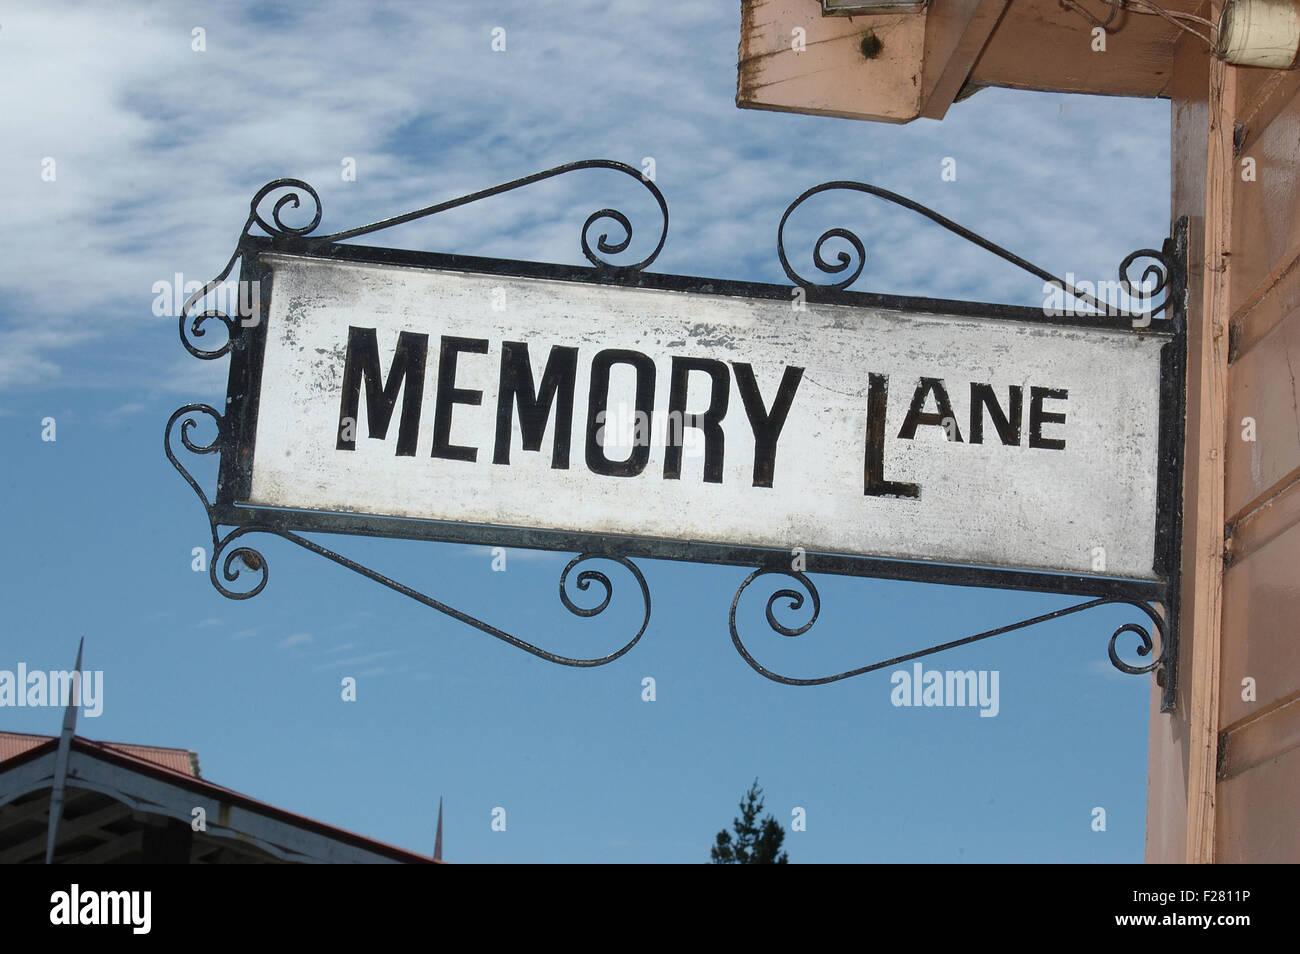 ornate street sign for Memory Lane, Shantytown, Westland, New Zealand - Stock Image